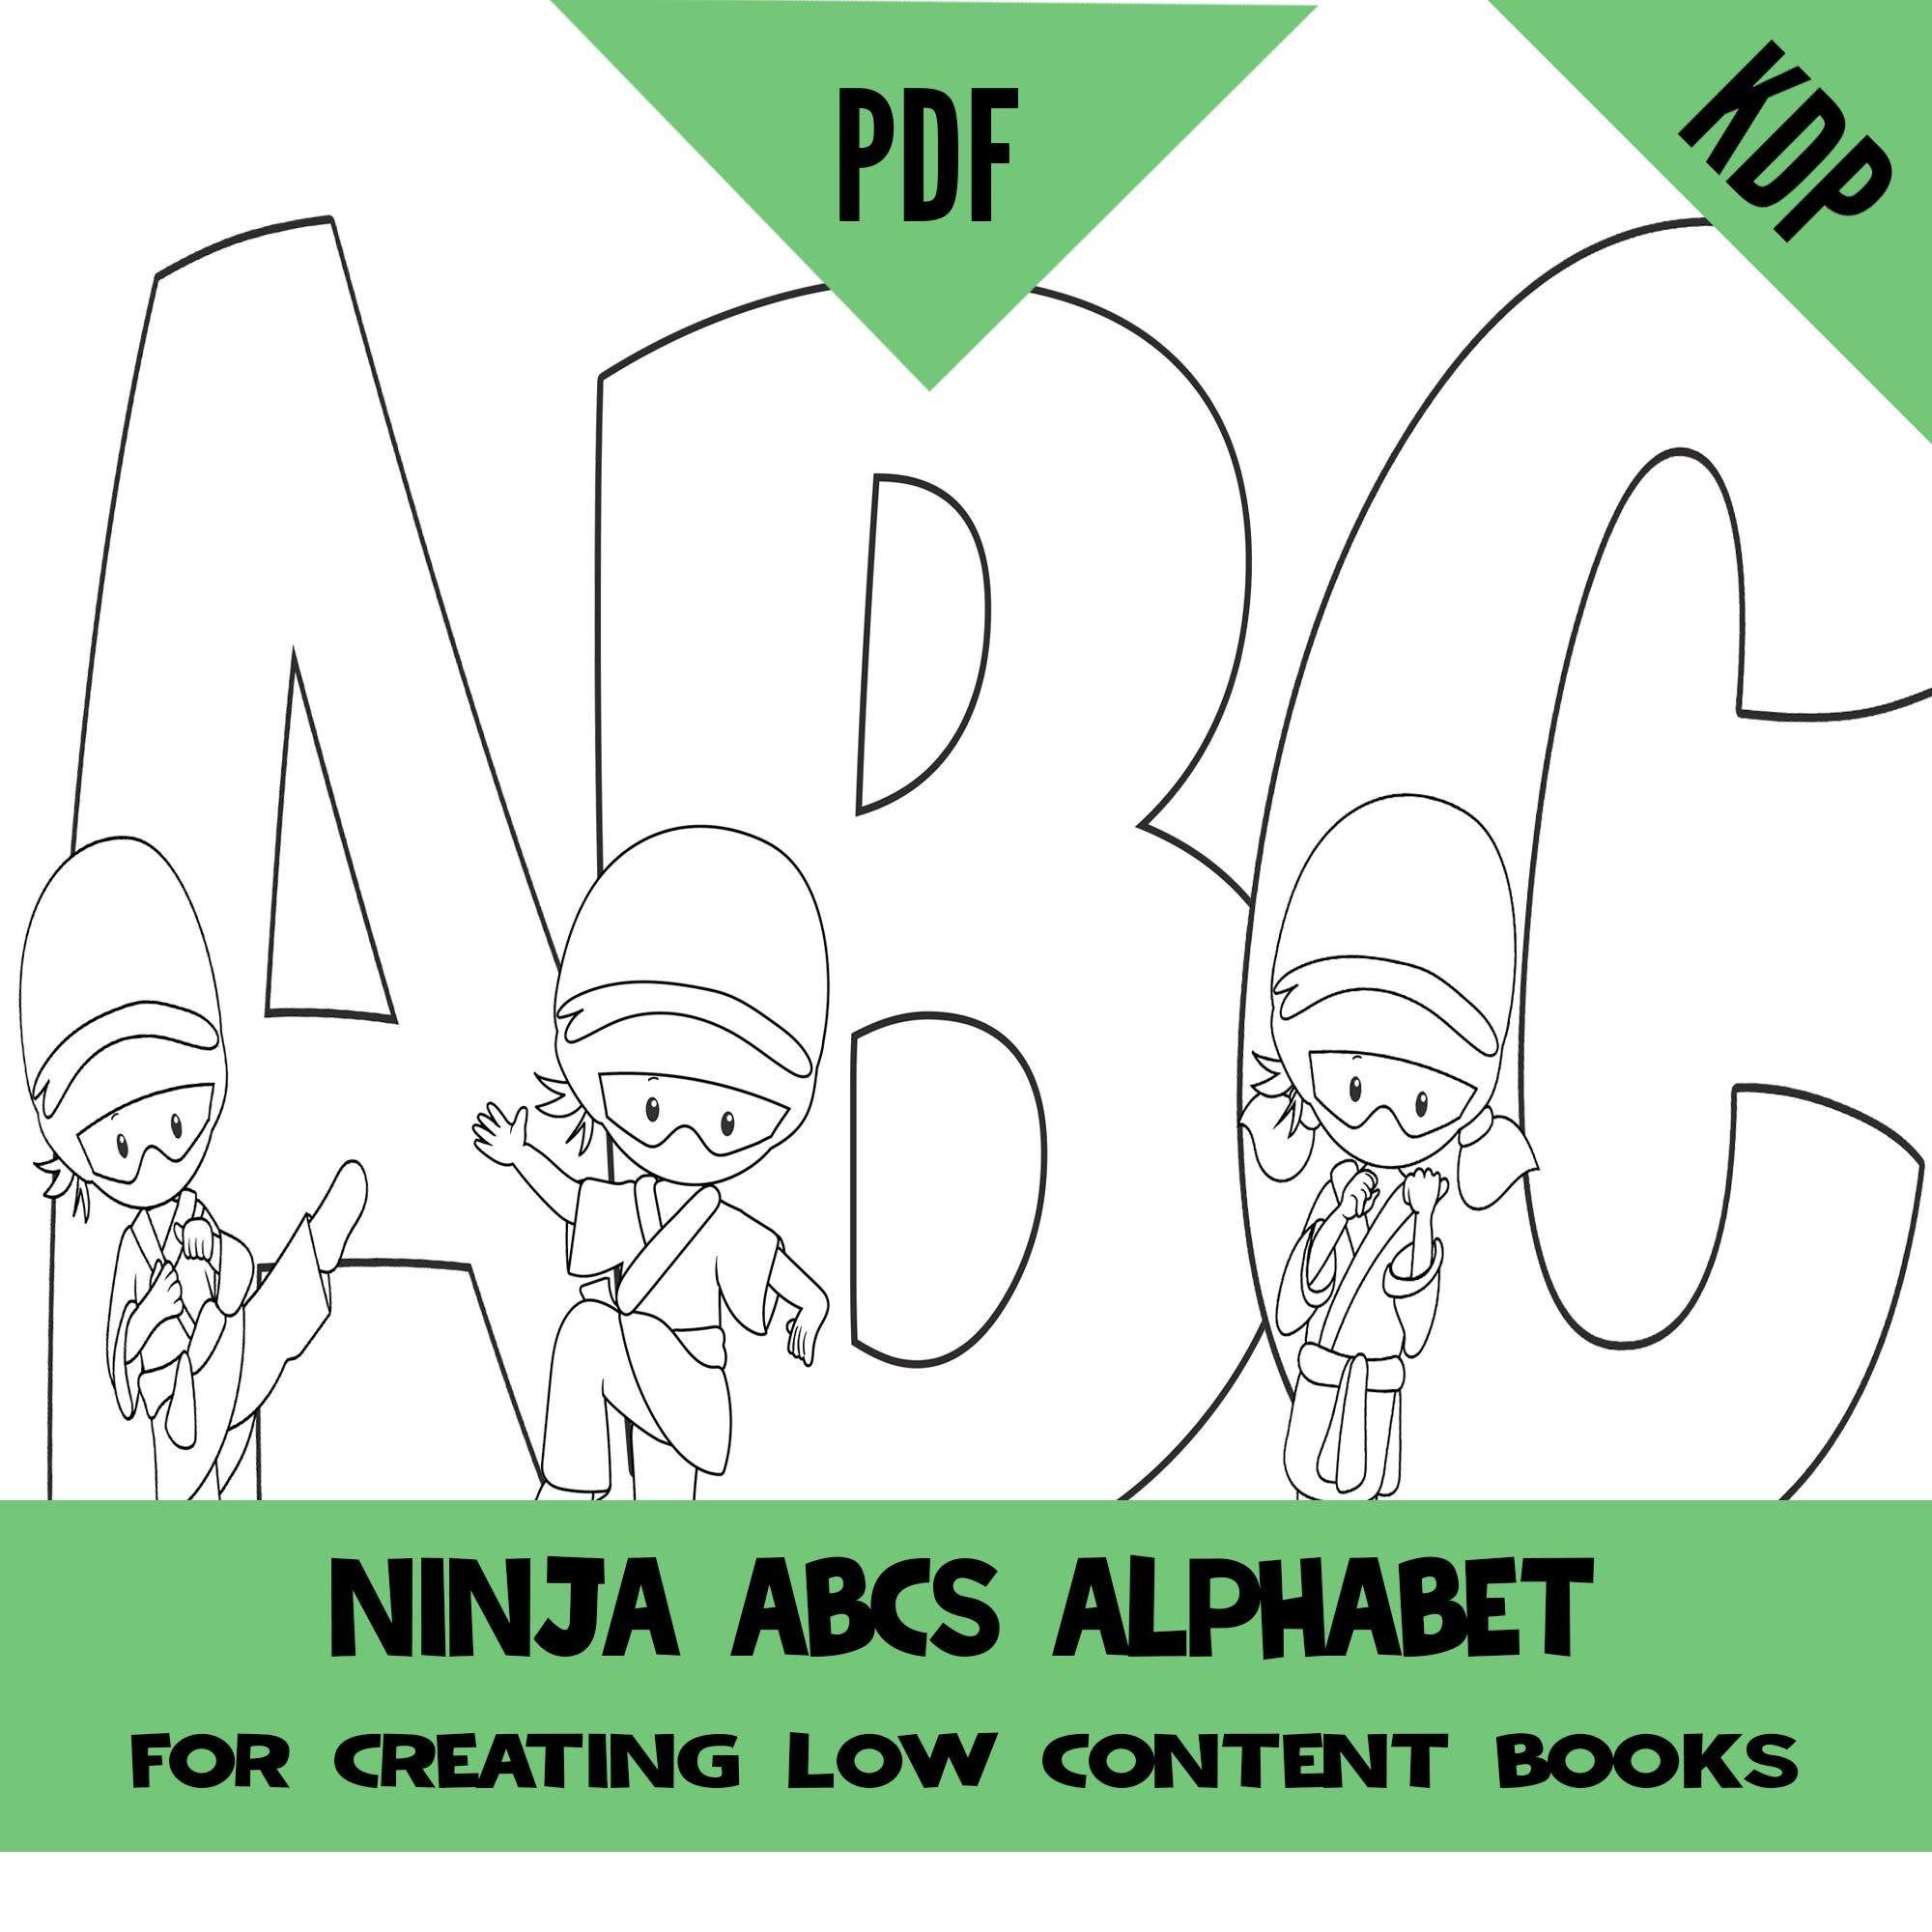 Kdp Abc Alphabet Ninja Coloring Interior Pages Sheets Pdf Etsy Abc Alphabet Coloring Books Abc